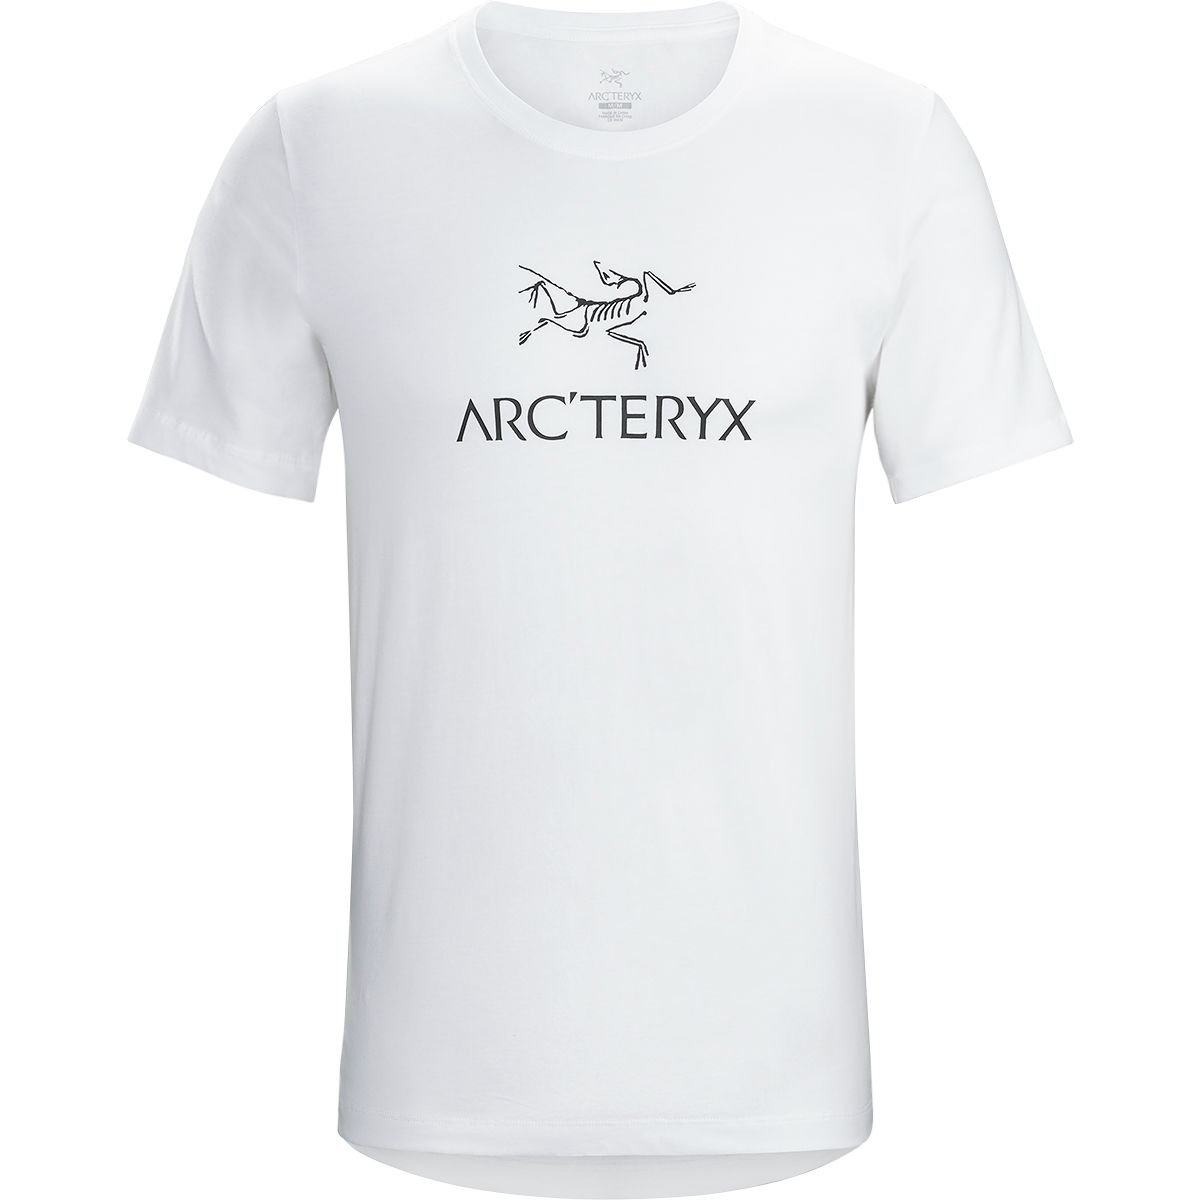 Arc ' teryx Arc 'word Tシャツ – メンズ B078T15819 L|ホワイト ホワイト L